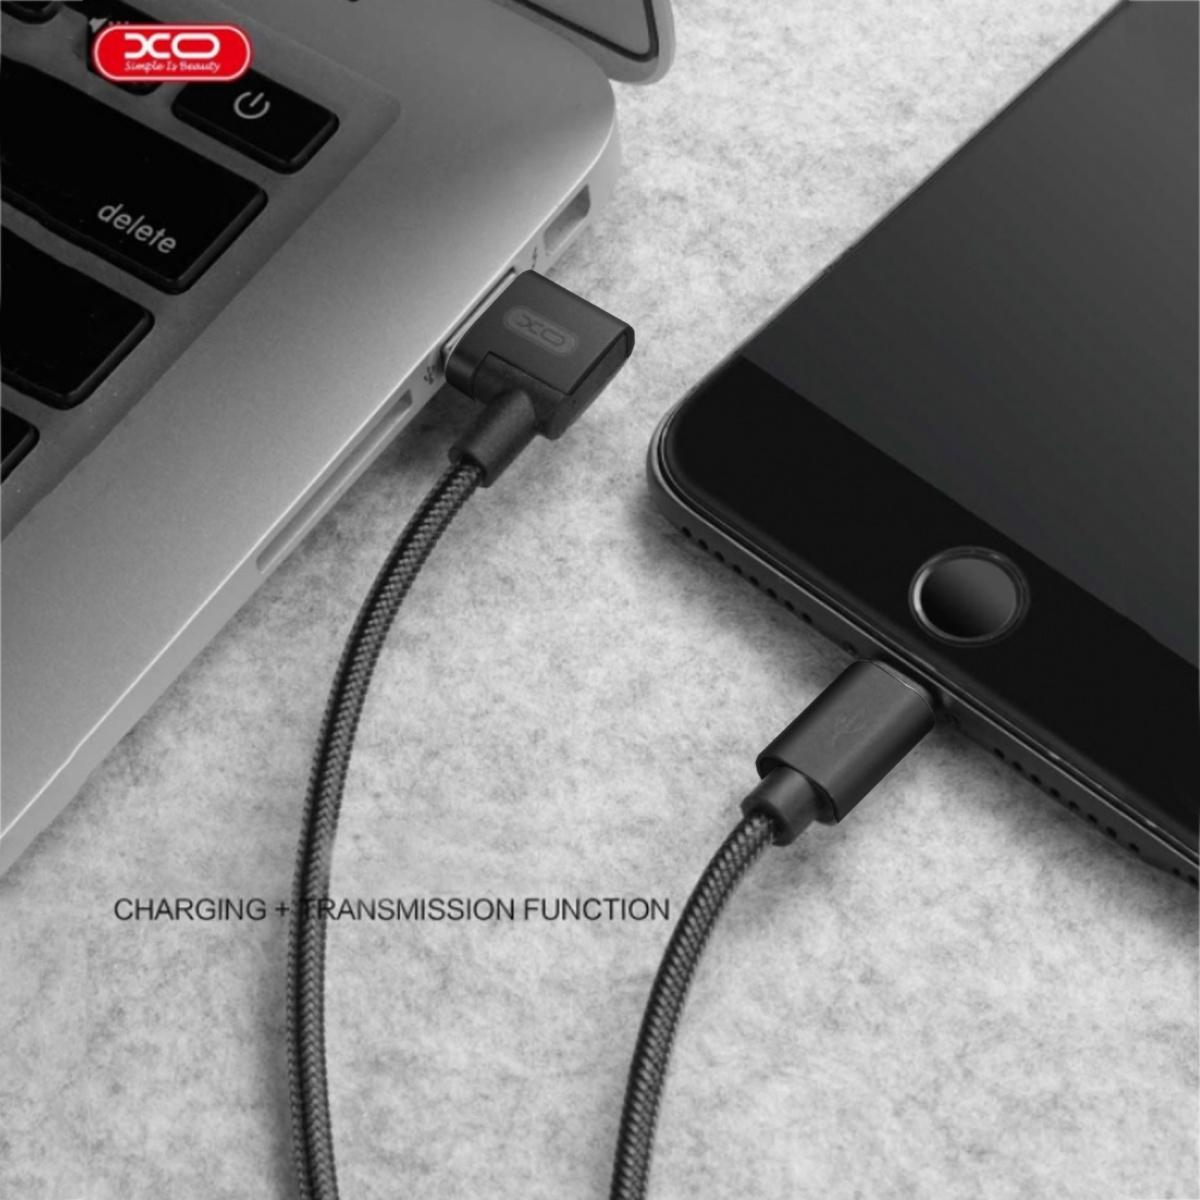 XO NB31 Micro USB Elbow Alloy 2.4A Cable - Black